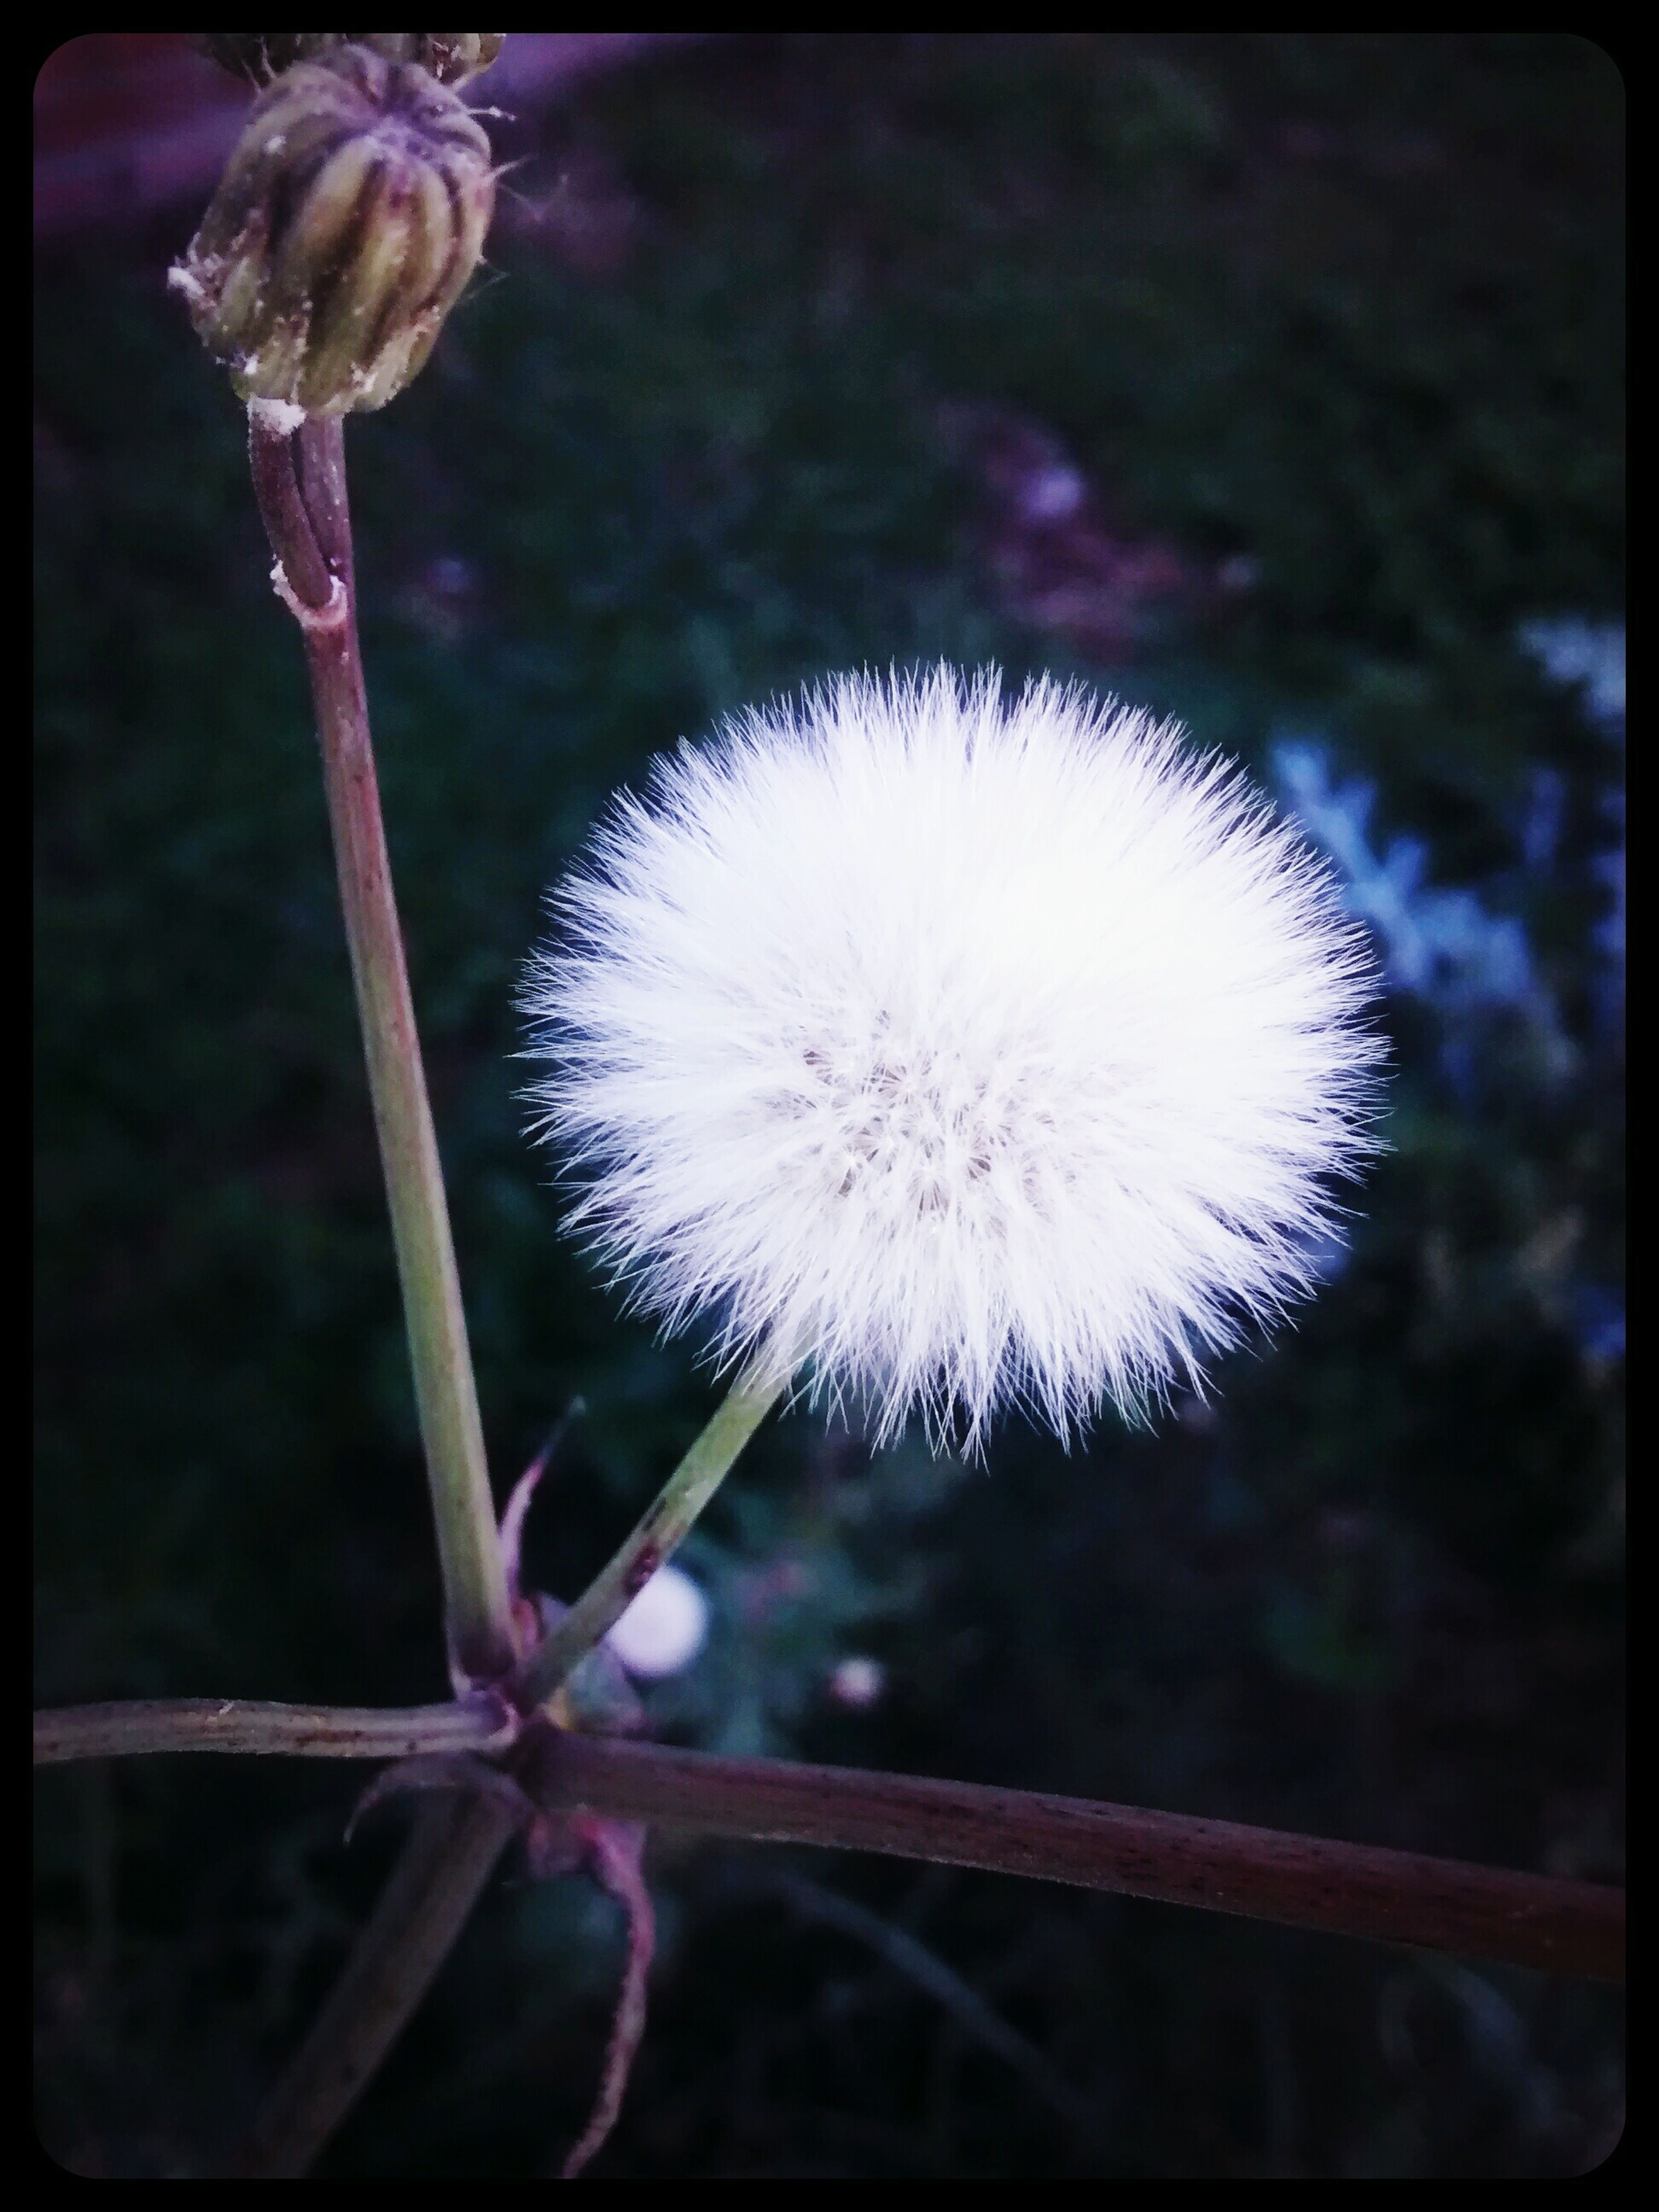 Flowers,Plants & Garden Flower#garden#nature#ecuador#santodomingoecuador#eyeEmfollowers#iphoneonly#nofiltrer#macro_garden#pretty#beautifulfollowmesho [a:1517186] White Flower *Diente de lEon*